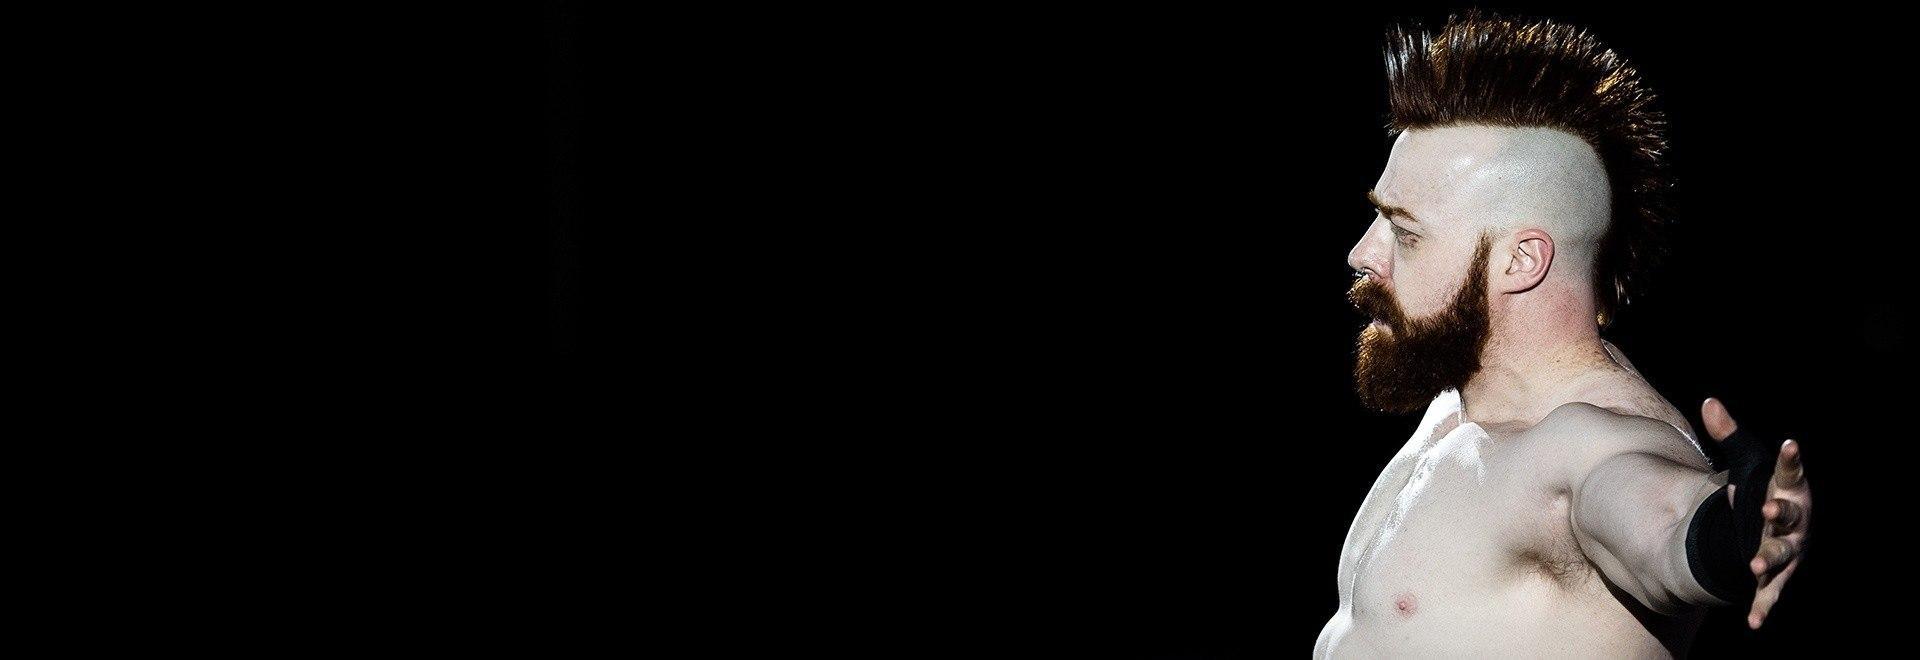 Ep. 251